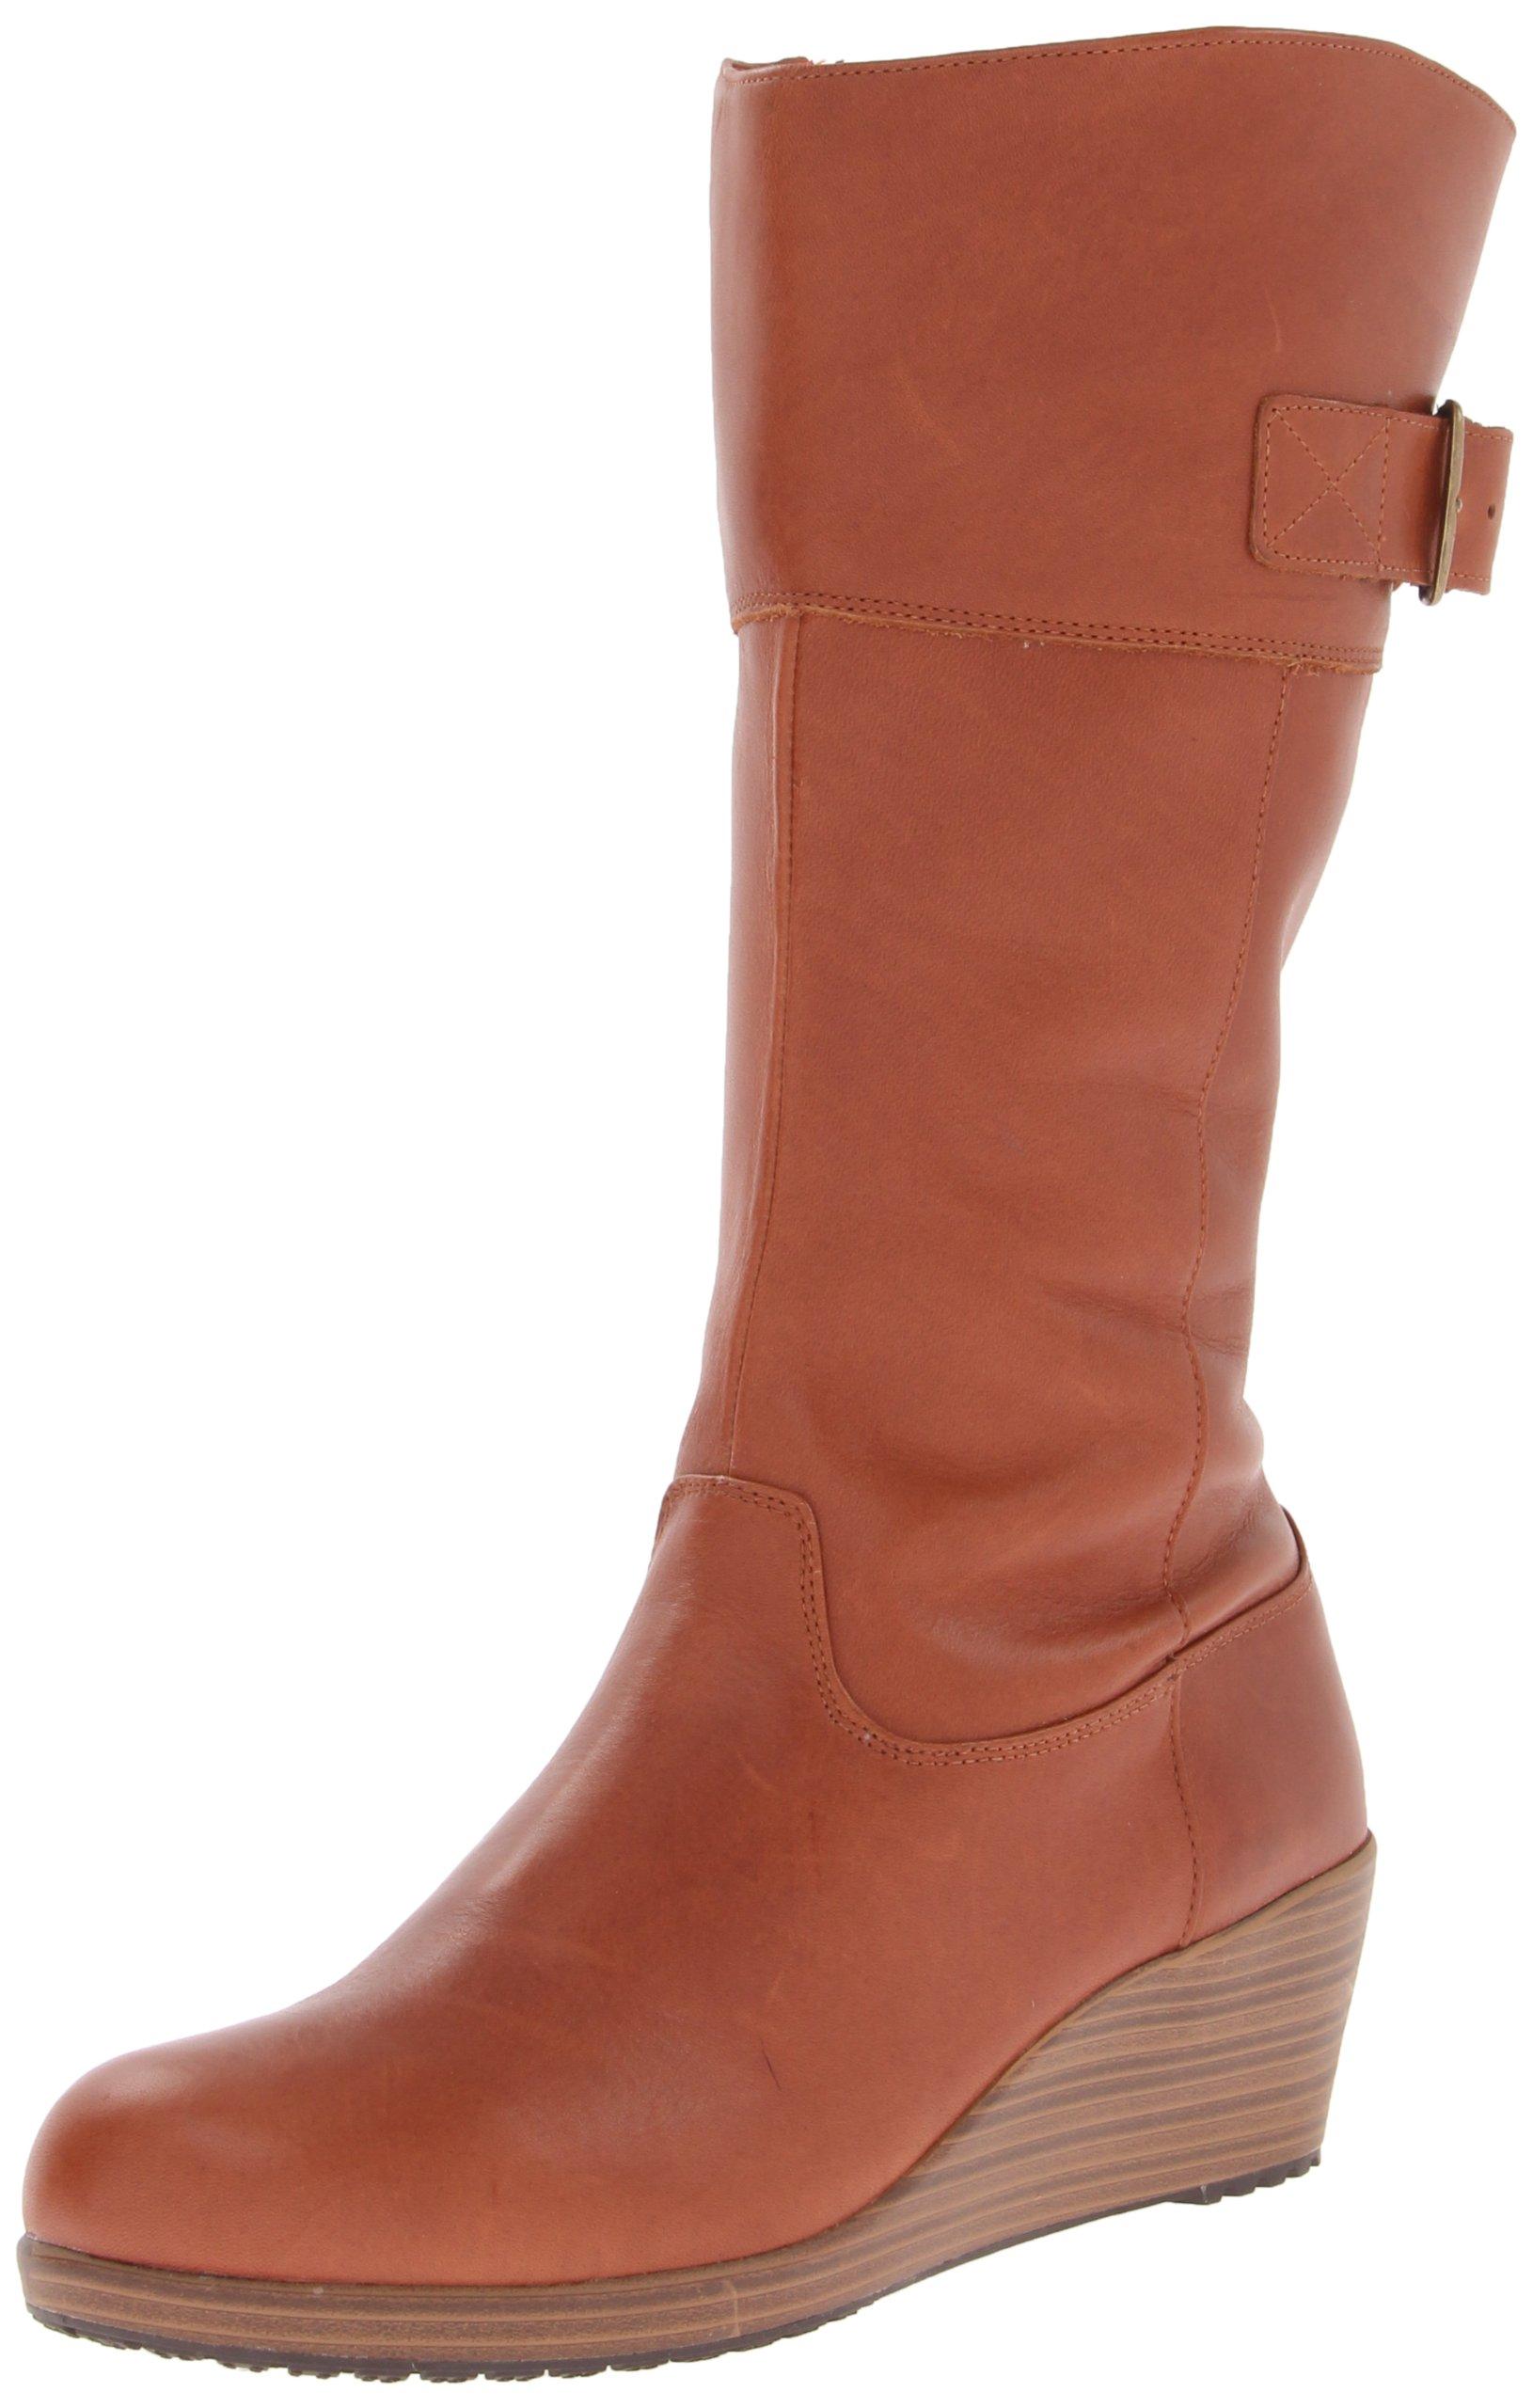 A BootBottes Eu Browncinnamon FemmeMarron leigh Crocs Leather walnut34 5 ZPiuOXTk